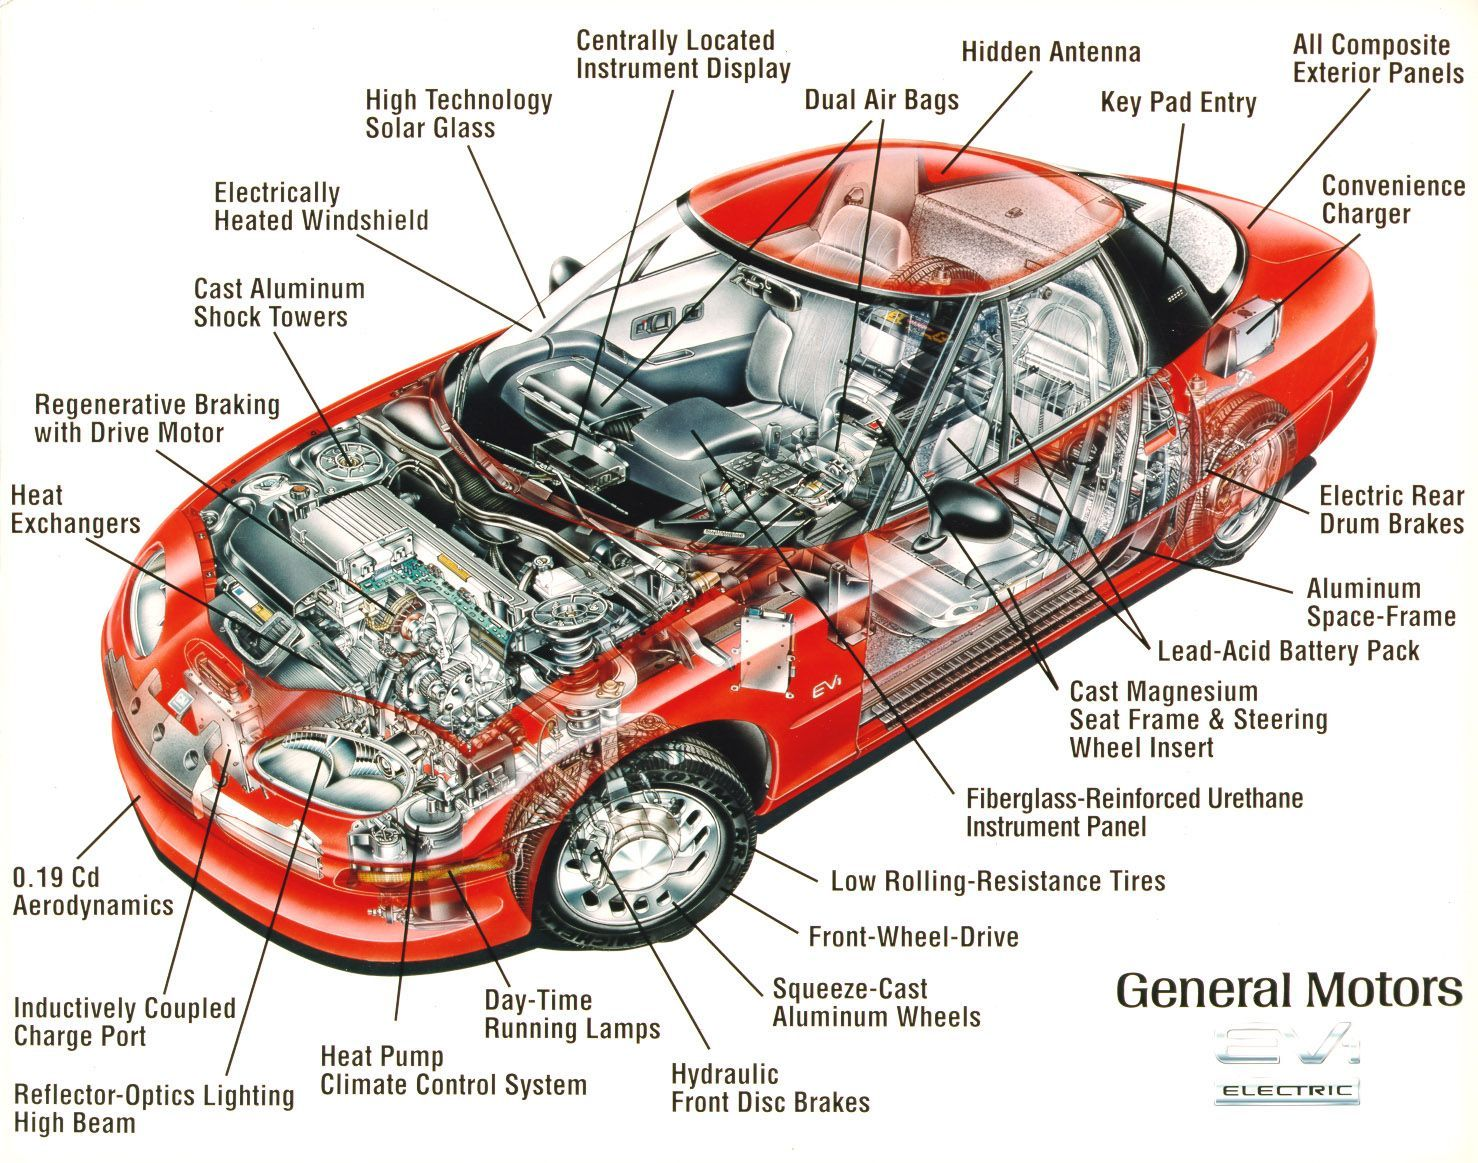 basic car diagram wiring diagram source car interior dashboard diagram basic car engine parts diagram general [ 1478 x 1163 Pixel ]